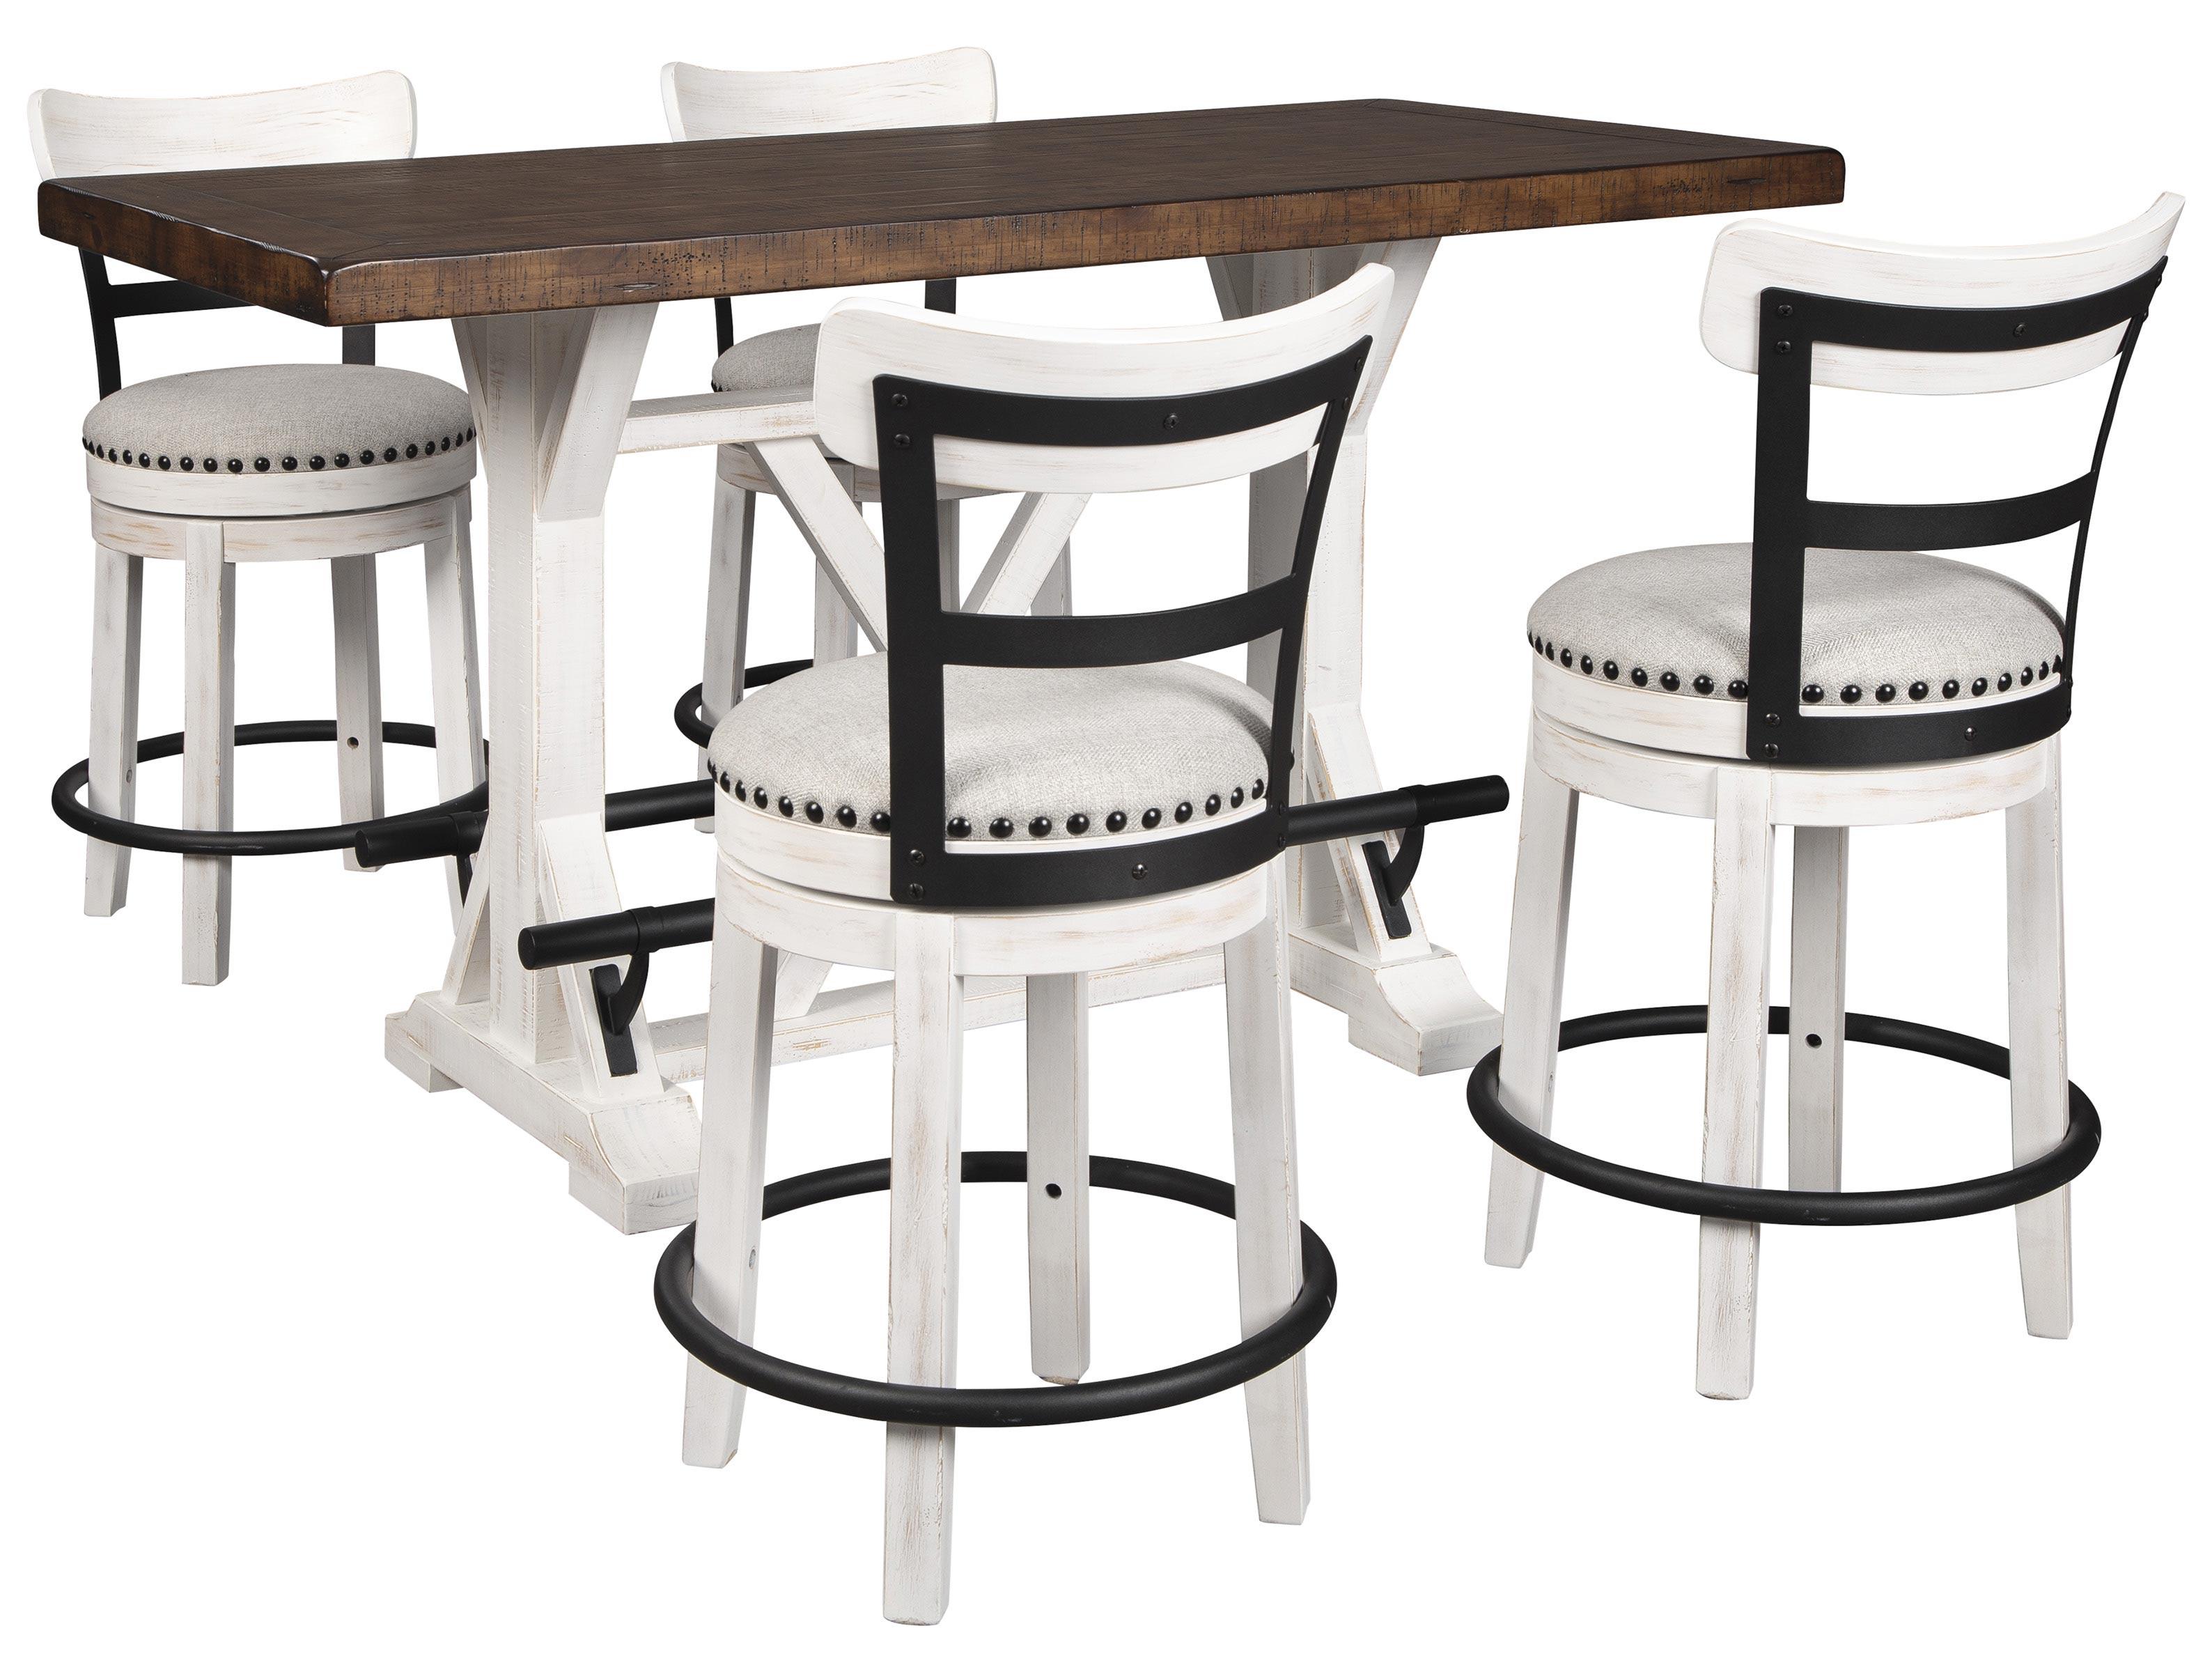 Buy Ashley Furniture Valebeck Rectangular Counter Dining Room Set In White Brown D546 530 Set